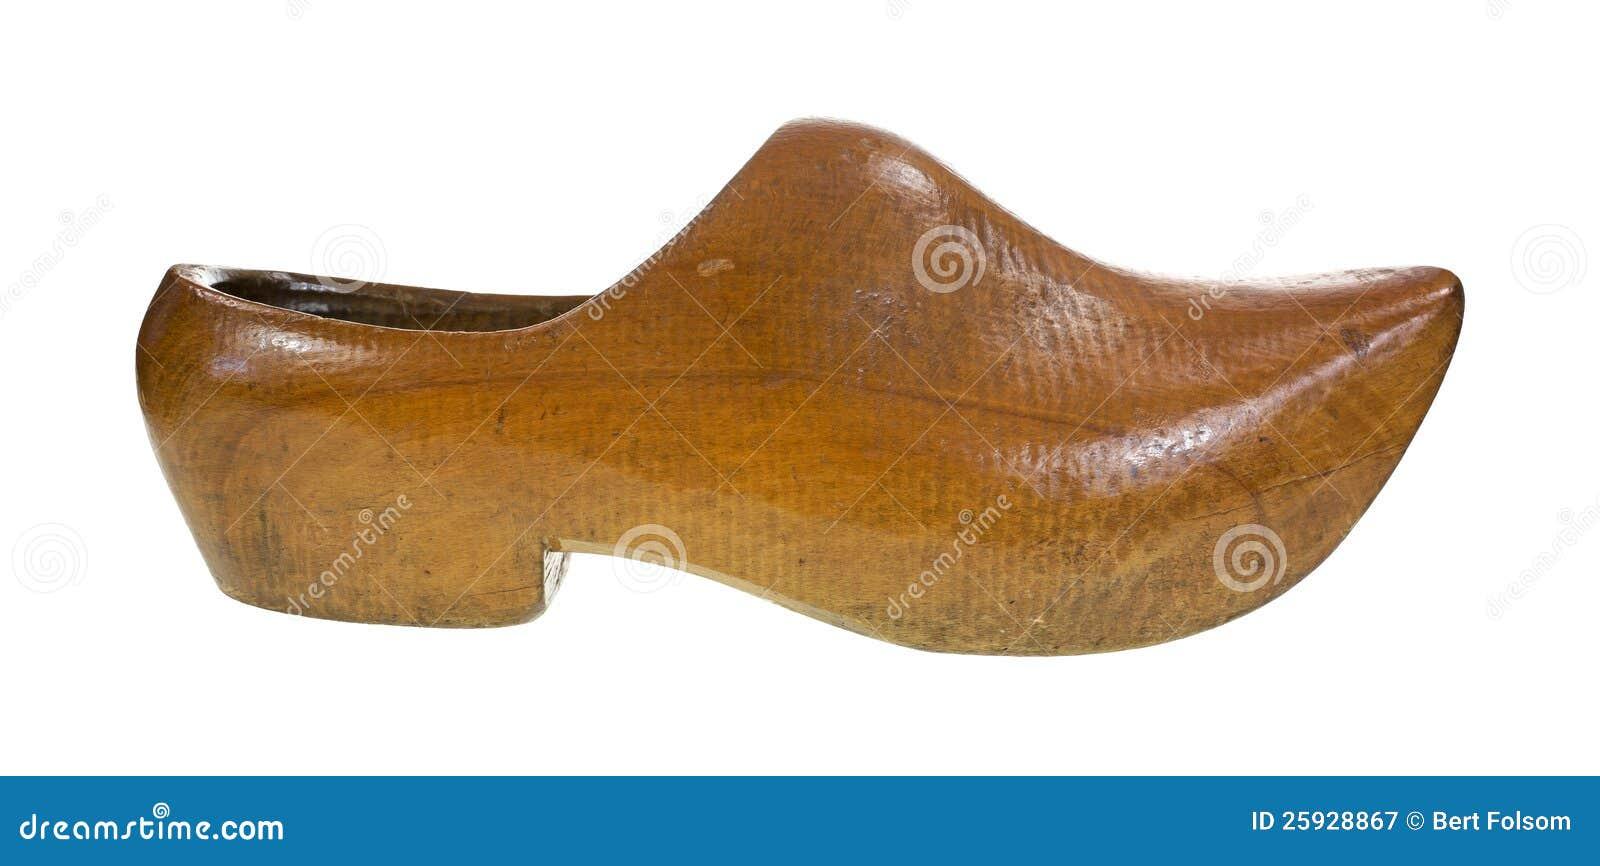 chaussure en bois lourde image stock image du chaussures 25928867. Black Bedroom Furniture Sets. Home Design Ideas